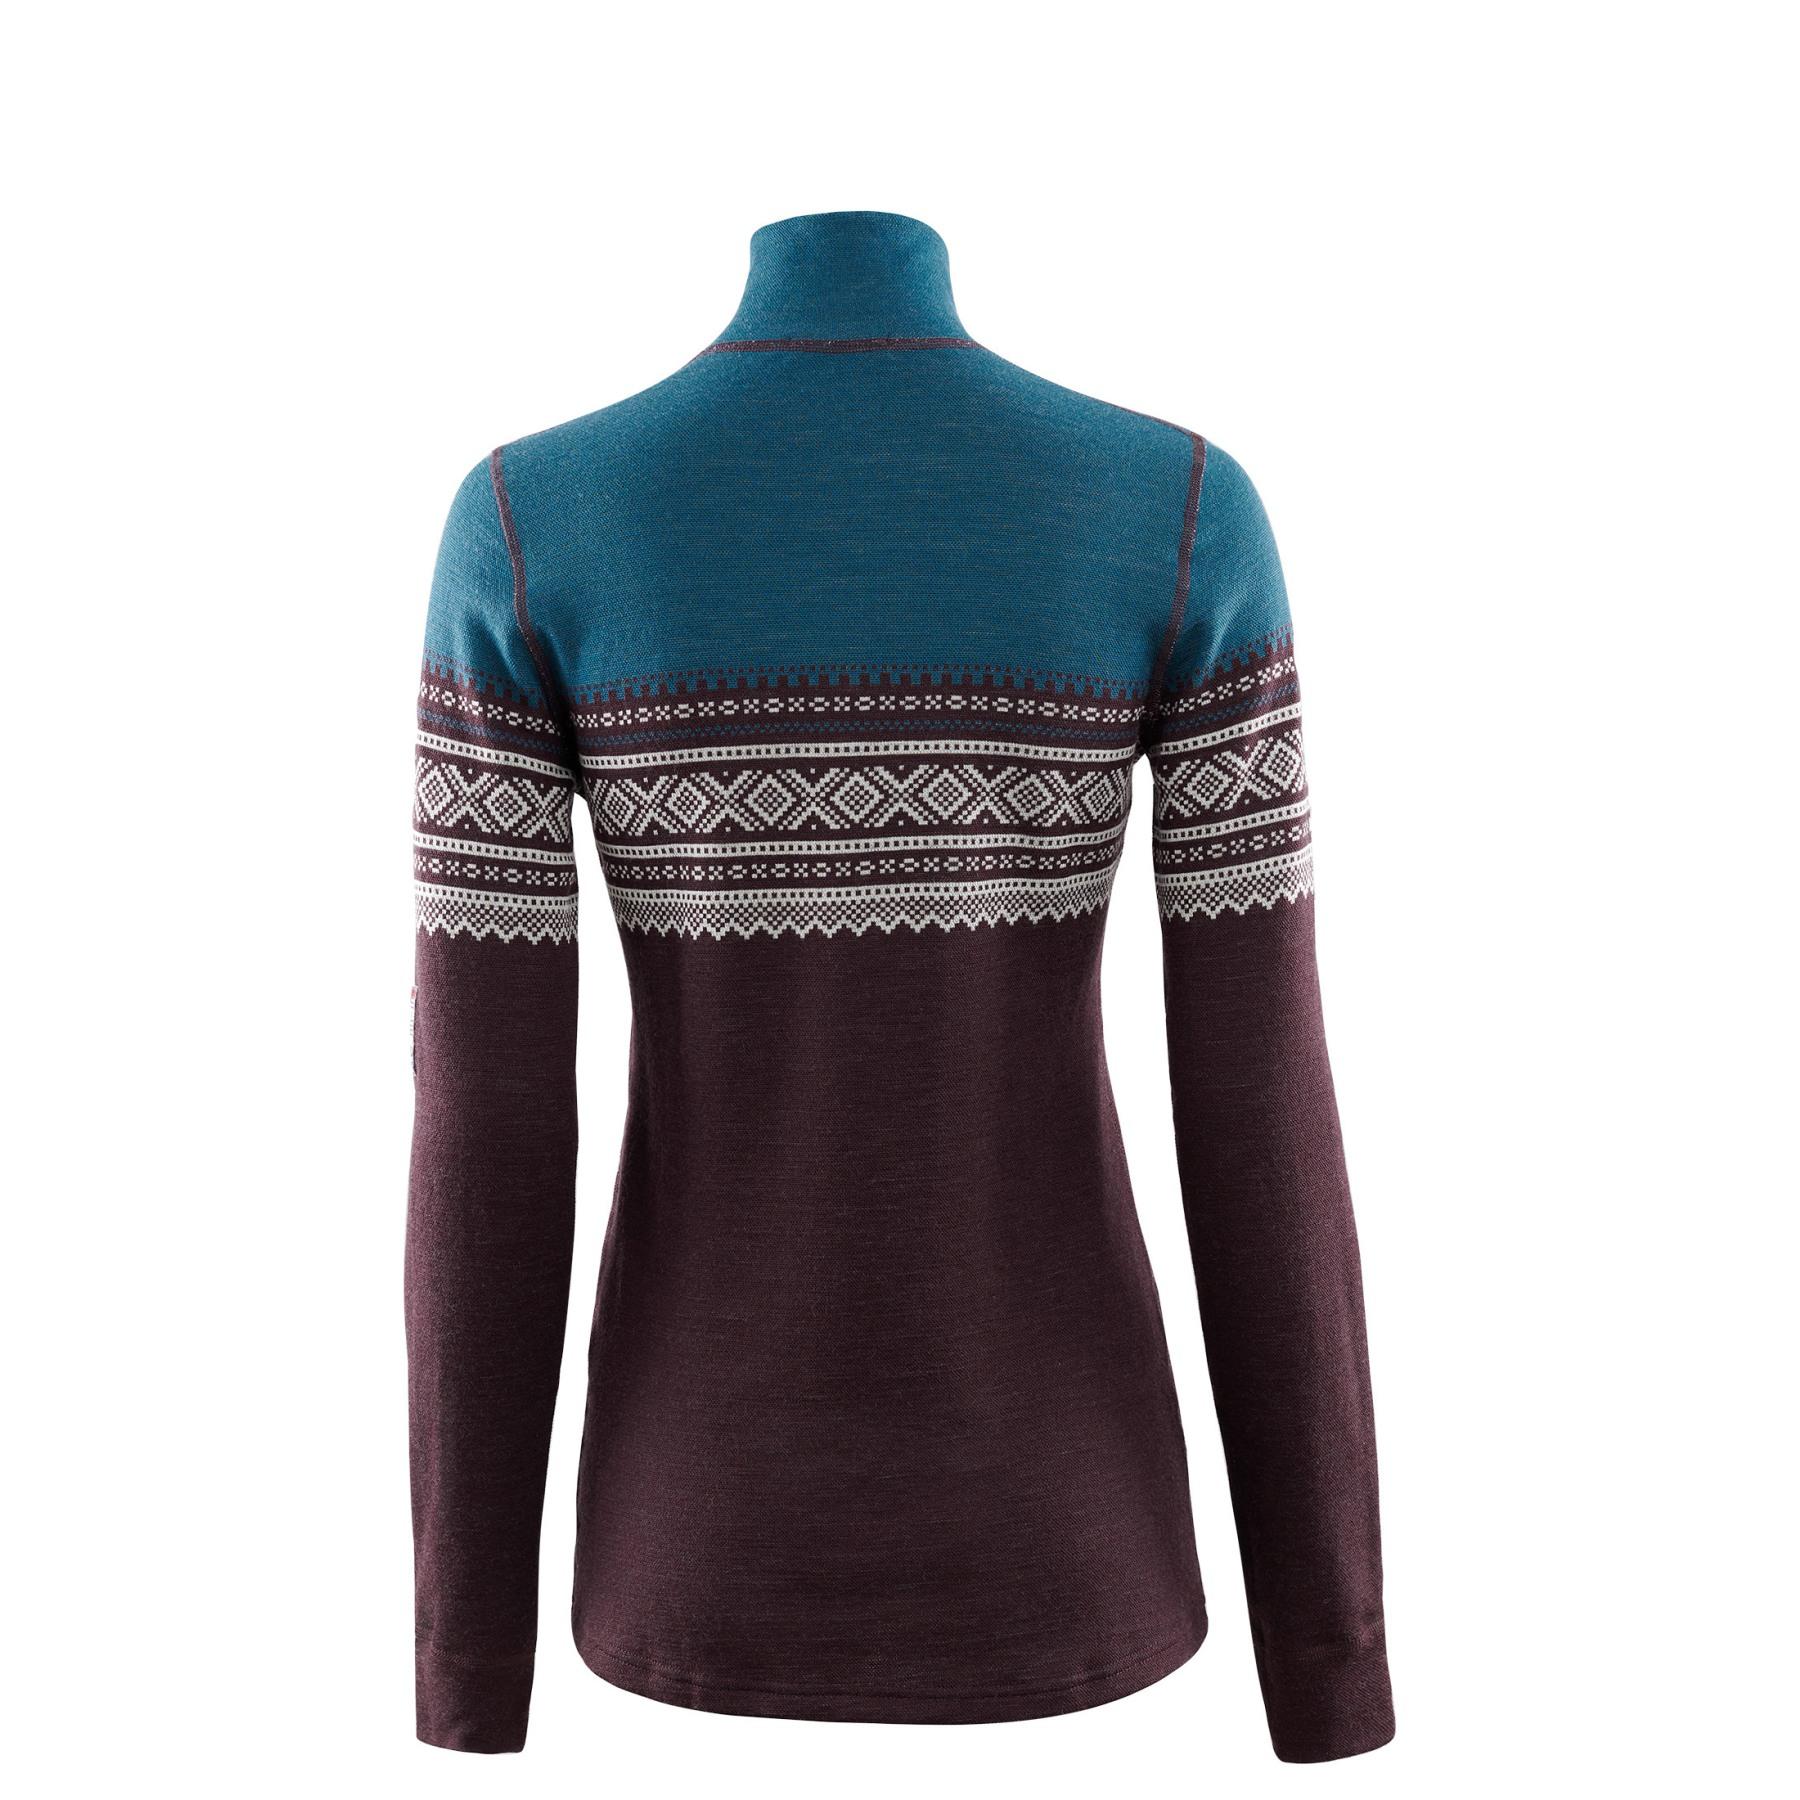 Image of Aclima Designwool Marius Mock Neck Women's Longsleeve Shirt with Zip - lifjell